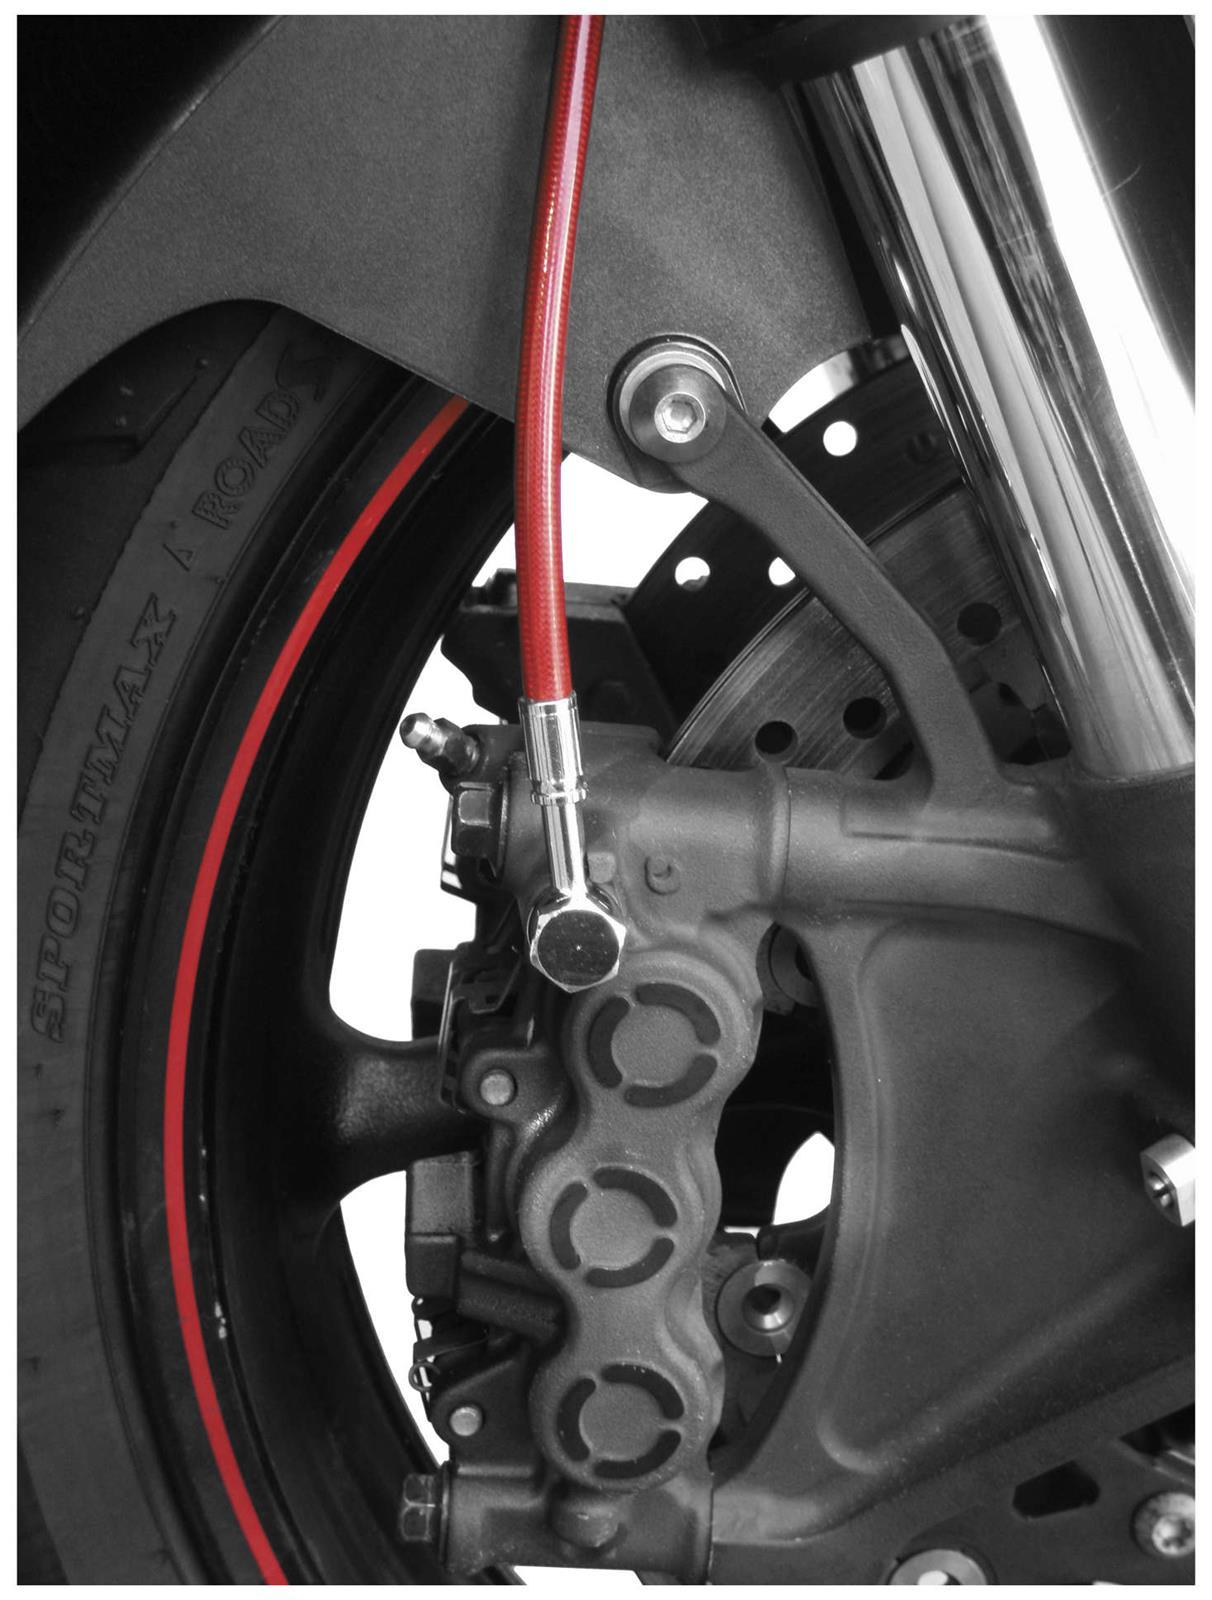 FK003D652CL Cruiser Brake and Clutch Line Kit Galfer Brakes